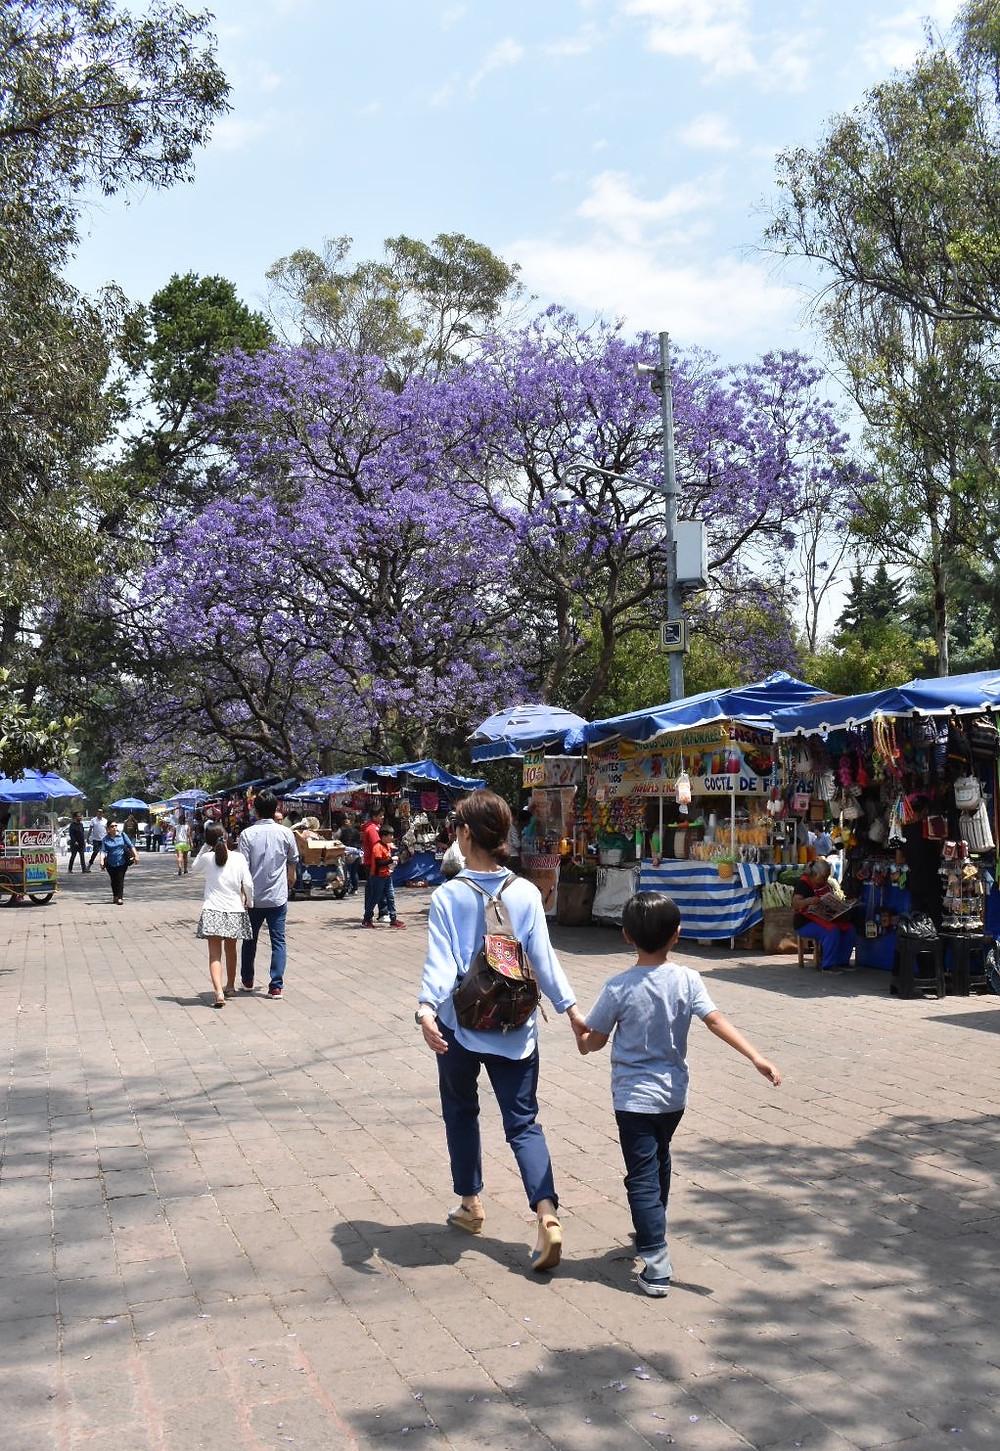 Mexico City vendors in Polanco